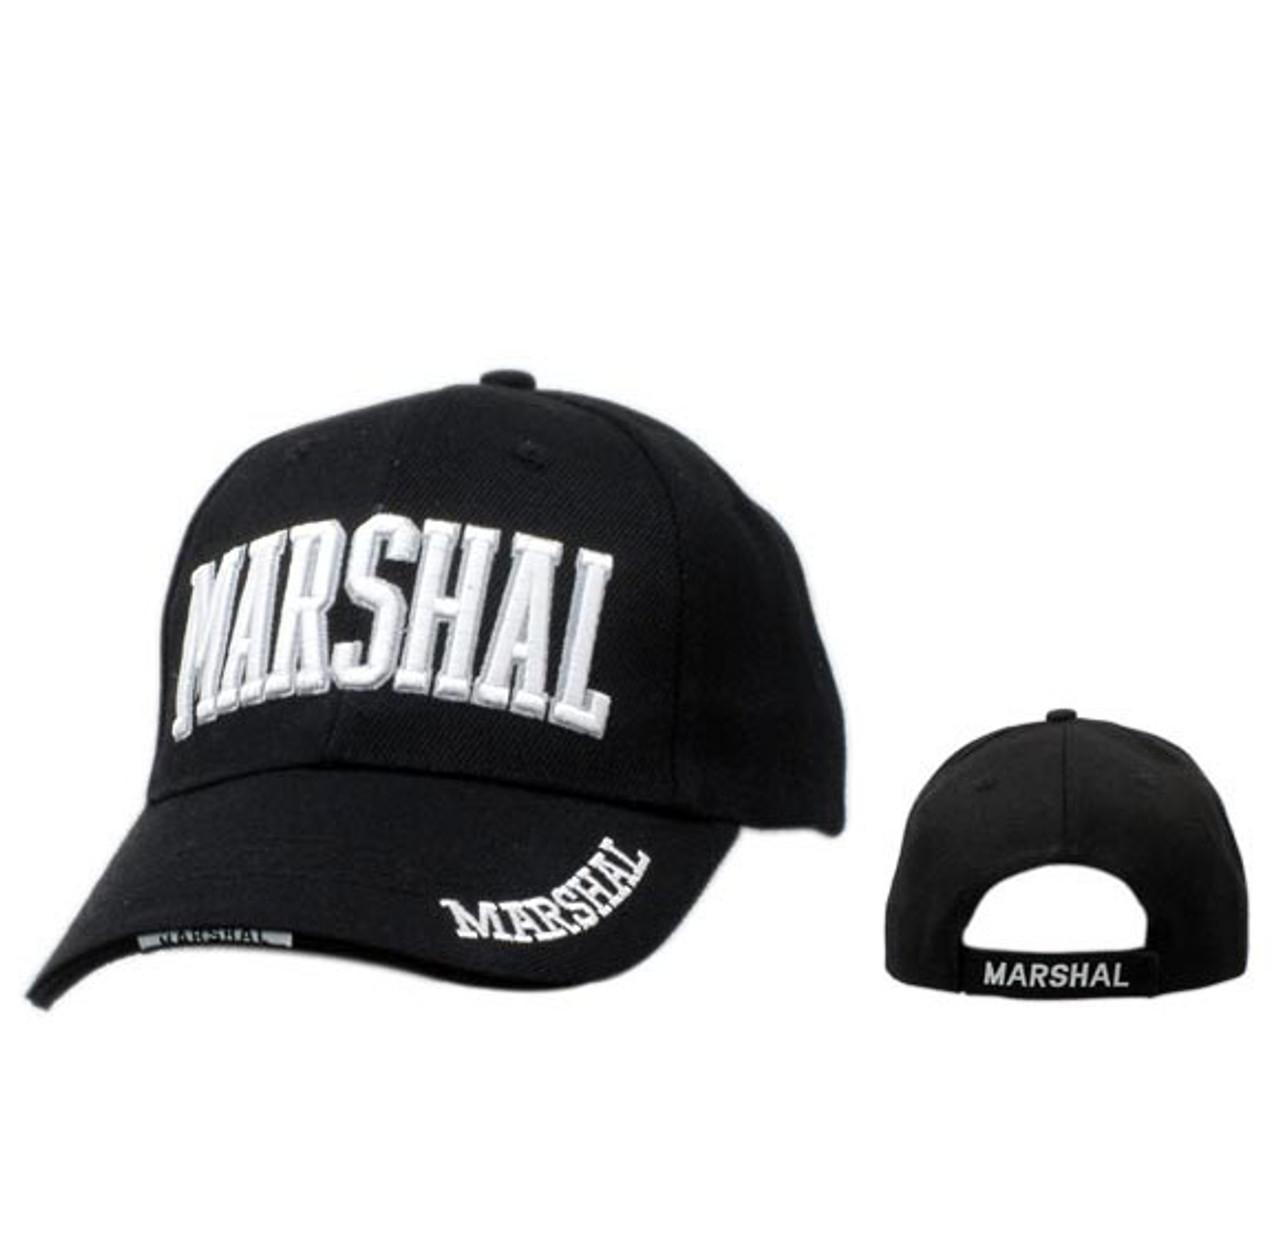 Wholesale Baseball Caps | Marshal